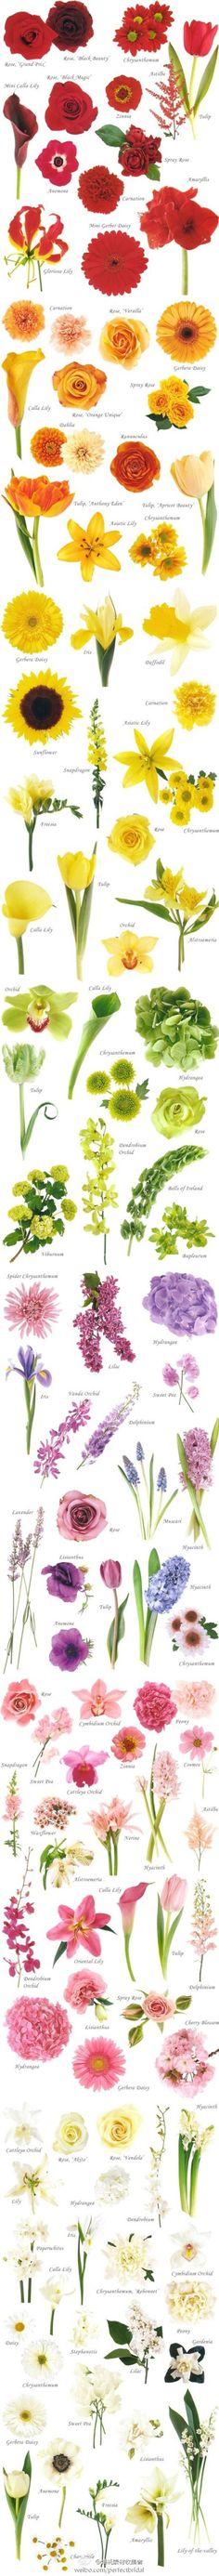 ~Flower Chart bouquet, weddings, wedding flowers, color charts, garden, flower guide, flower names, flower types, flower chart